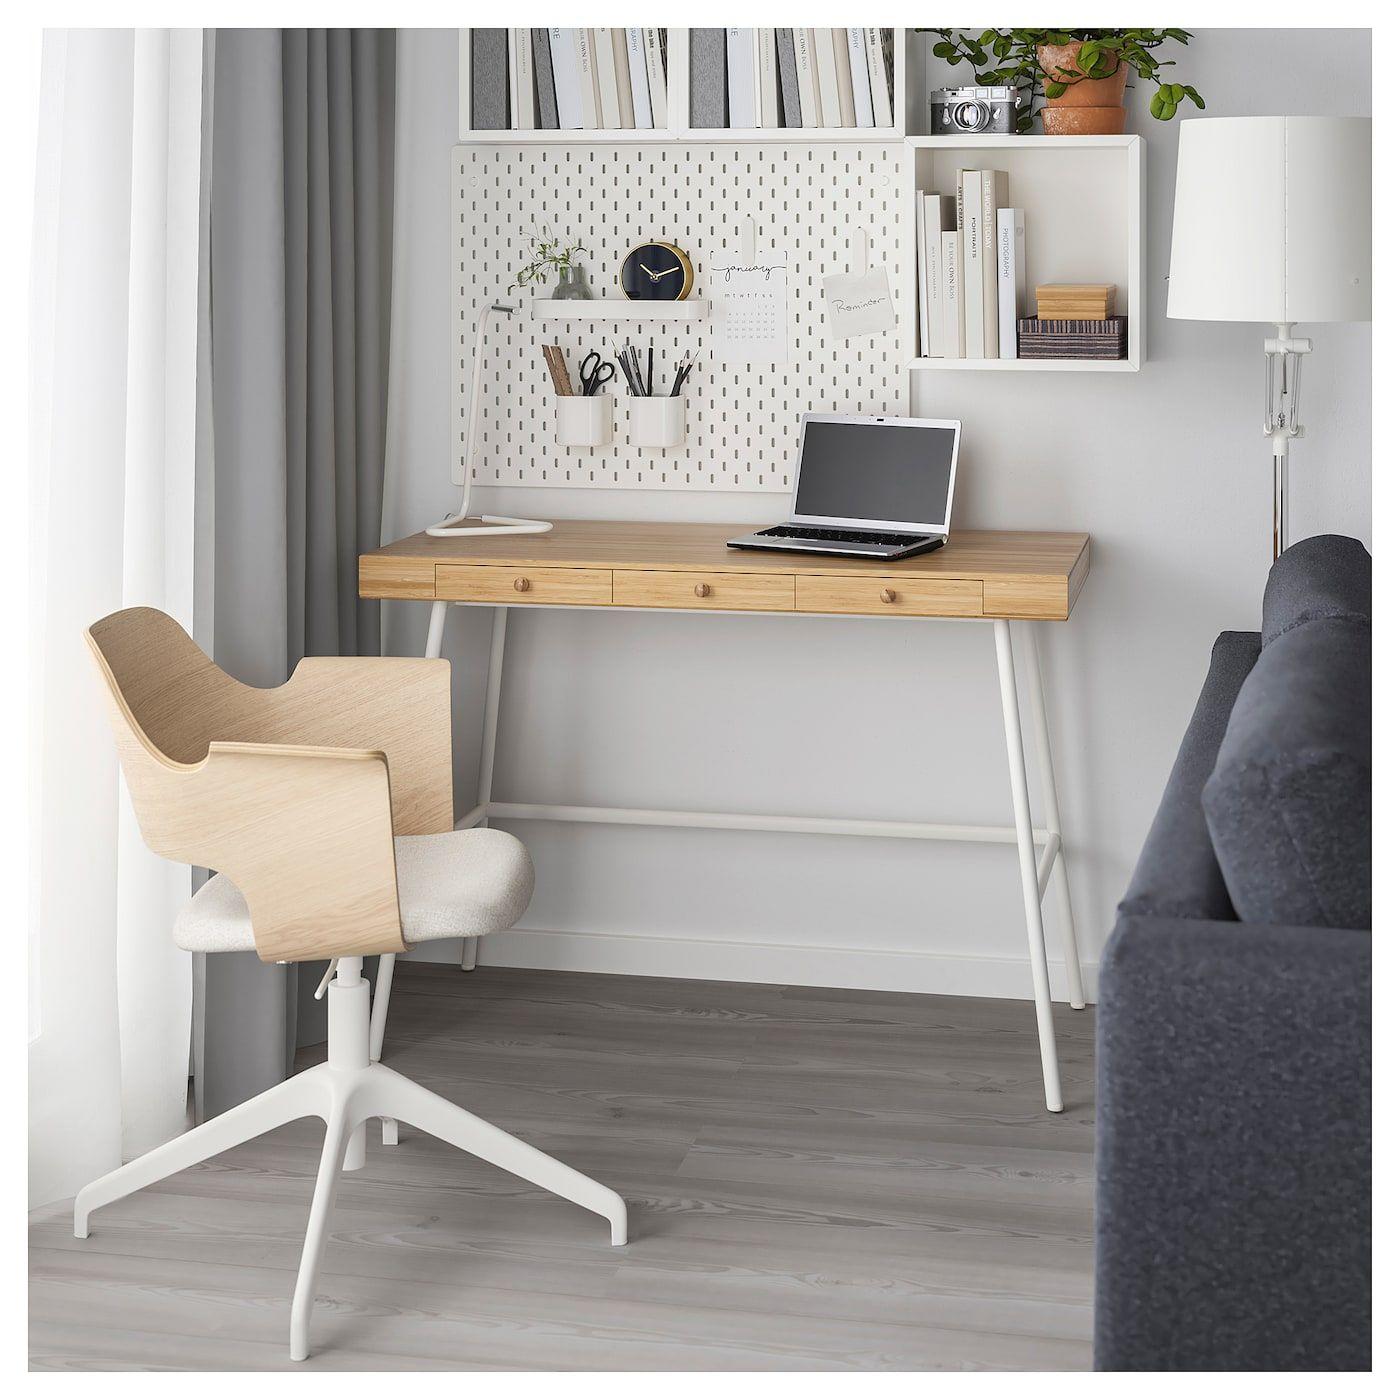 Lillasen Bureau Bamboe 102x49 Cm Ikea Ikea Desk Ikea Bedroom Desk